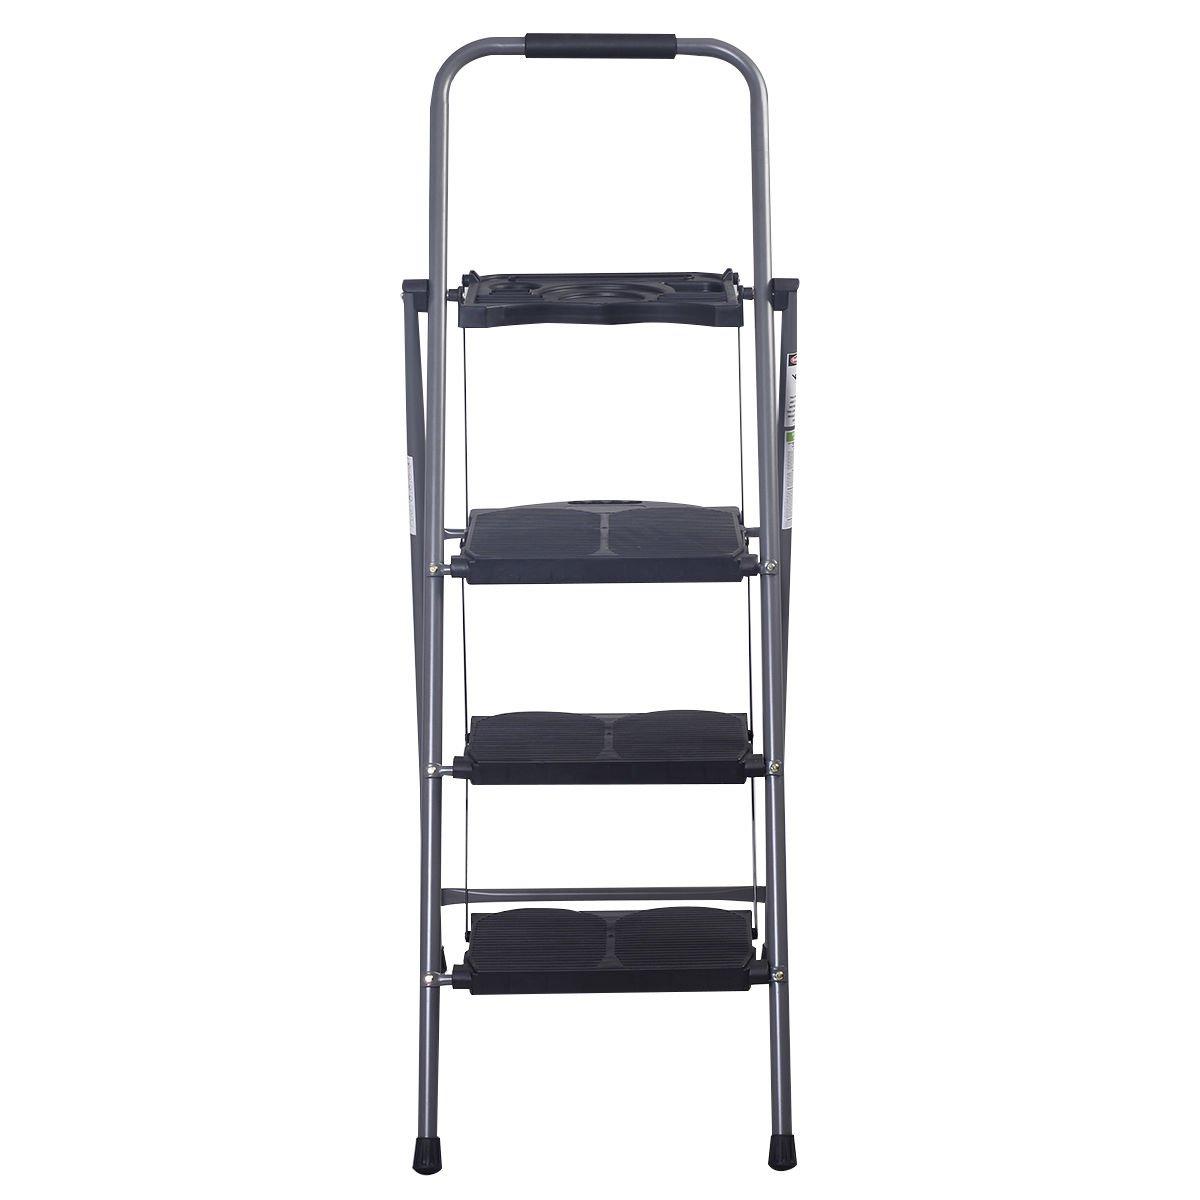 3 Step Ladder Platform Folding Stool 330 LBS Capacity Space Saving Tray